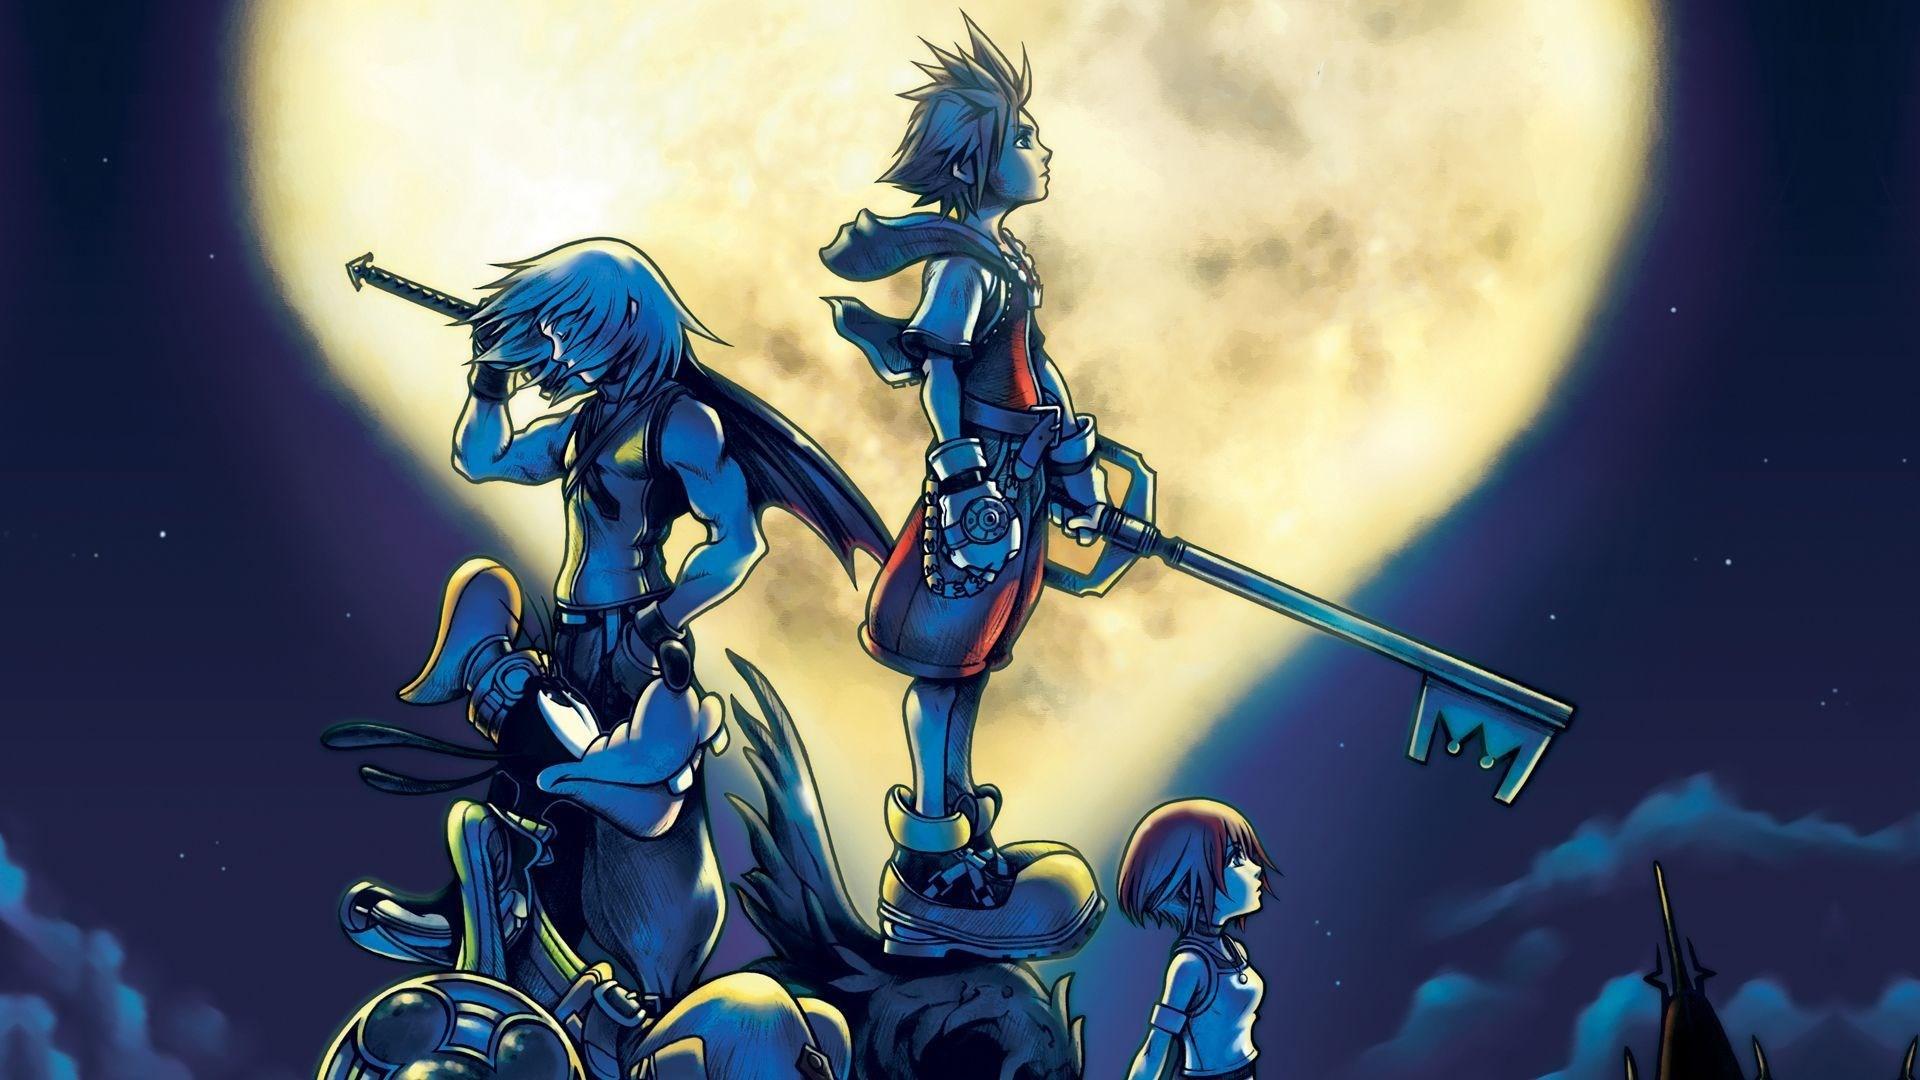 Kingdom Hearts Wallpaper (78+ images)